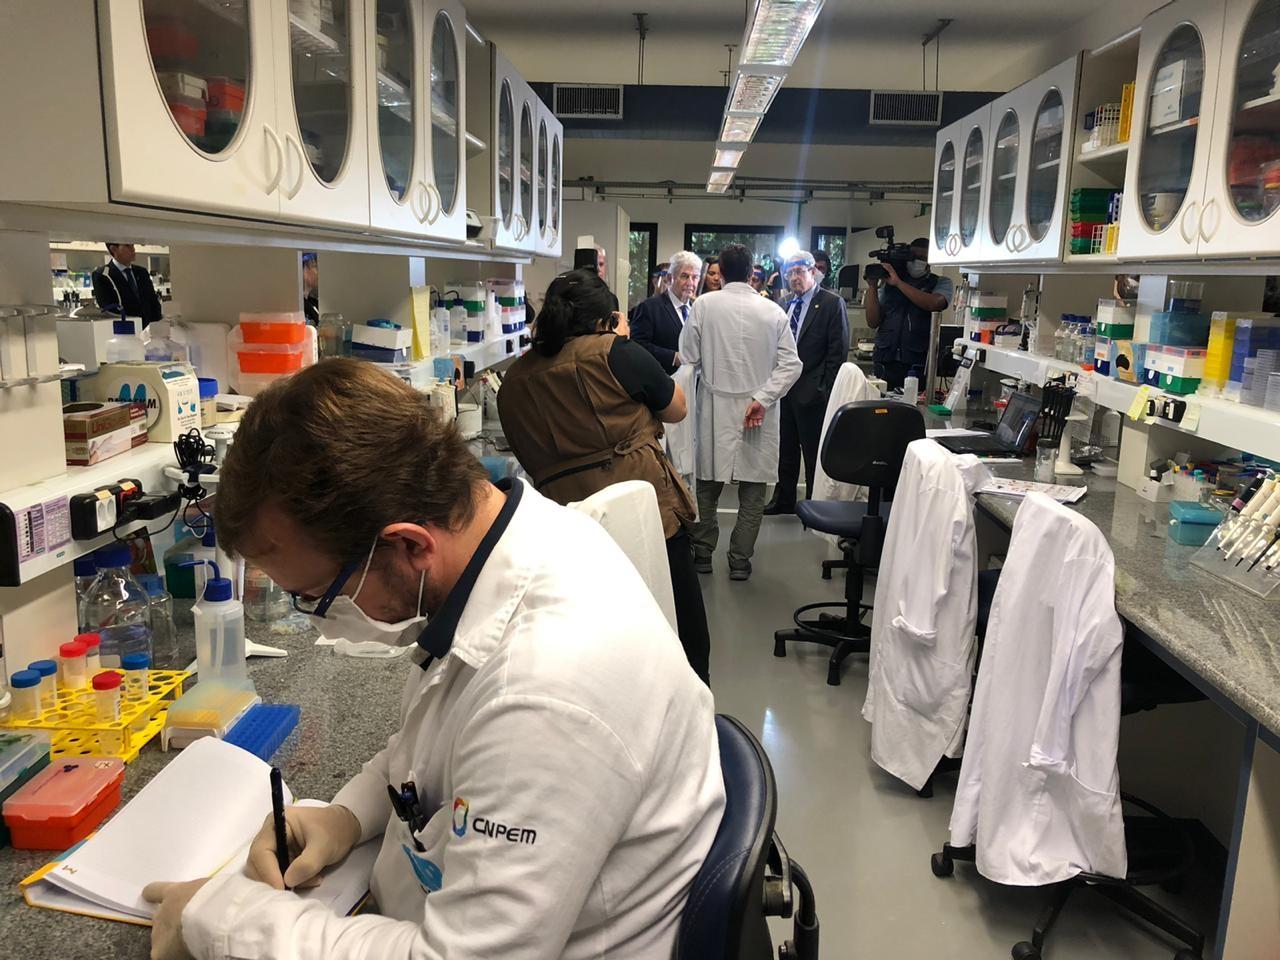 Centro nacional de pesquisas de Campinas seleciona 2 remédios para coquetel contra coronavírus e começa testes in vitro